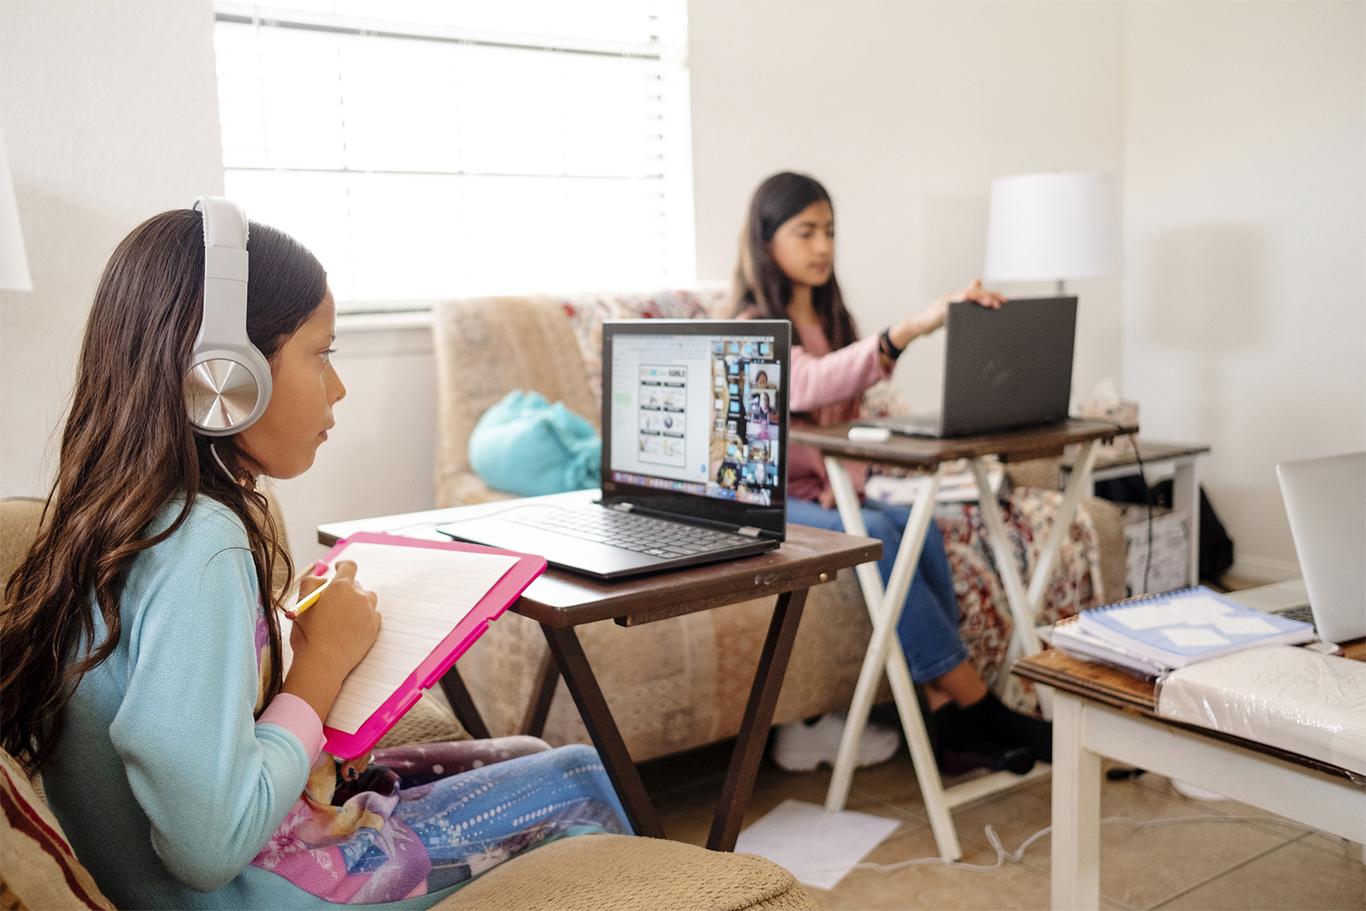 Main visual : Supporting education through COVID-19